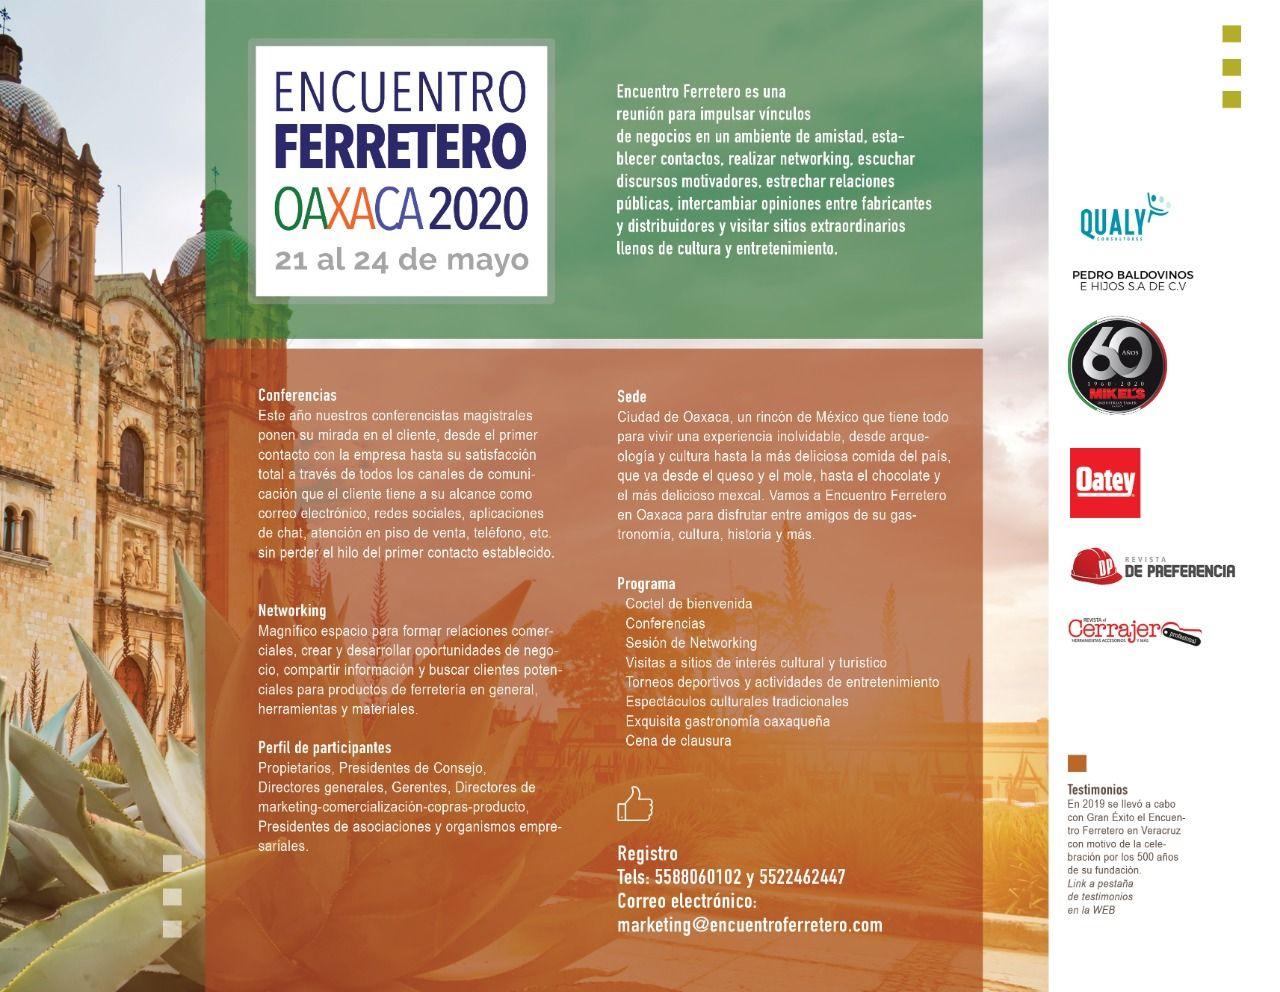 Oaxaca 2020 Discursos Motivadores Ferretero Encuentro